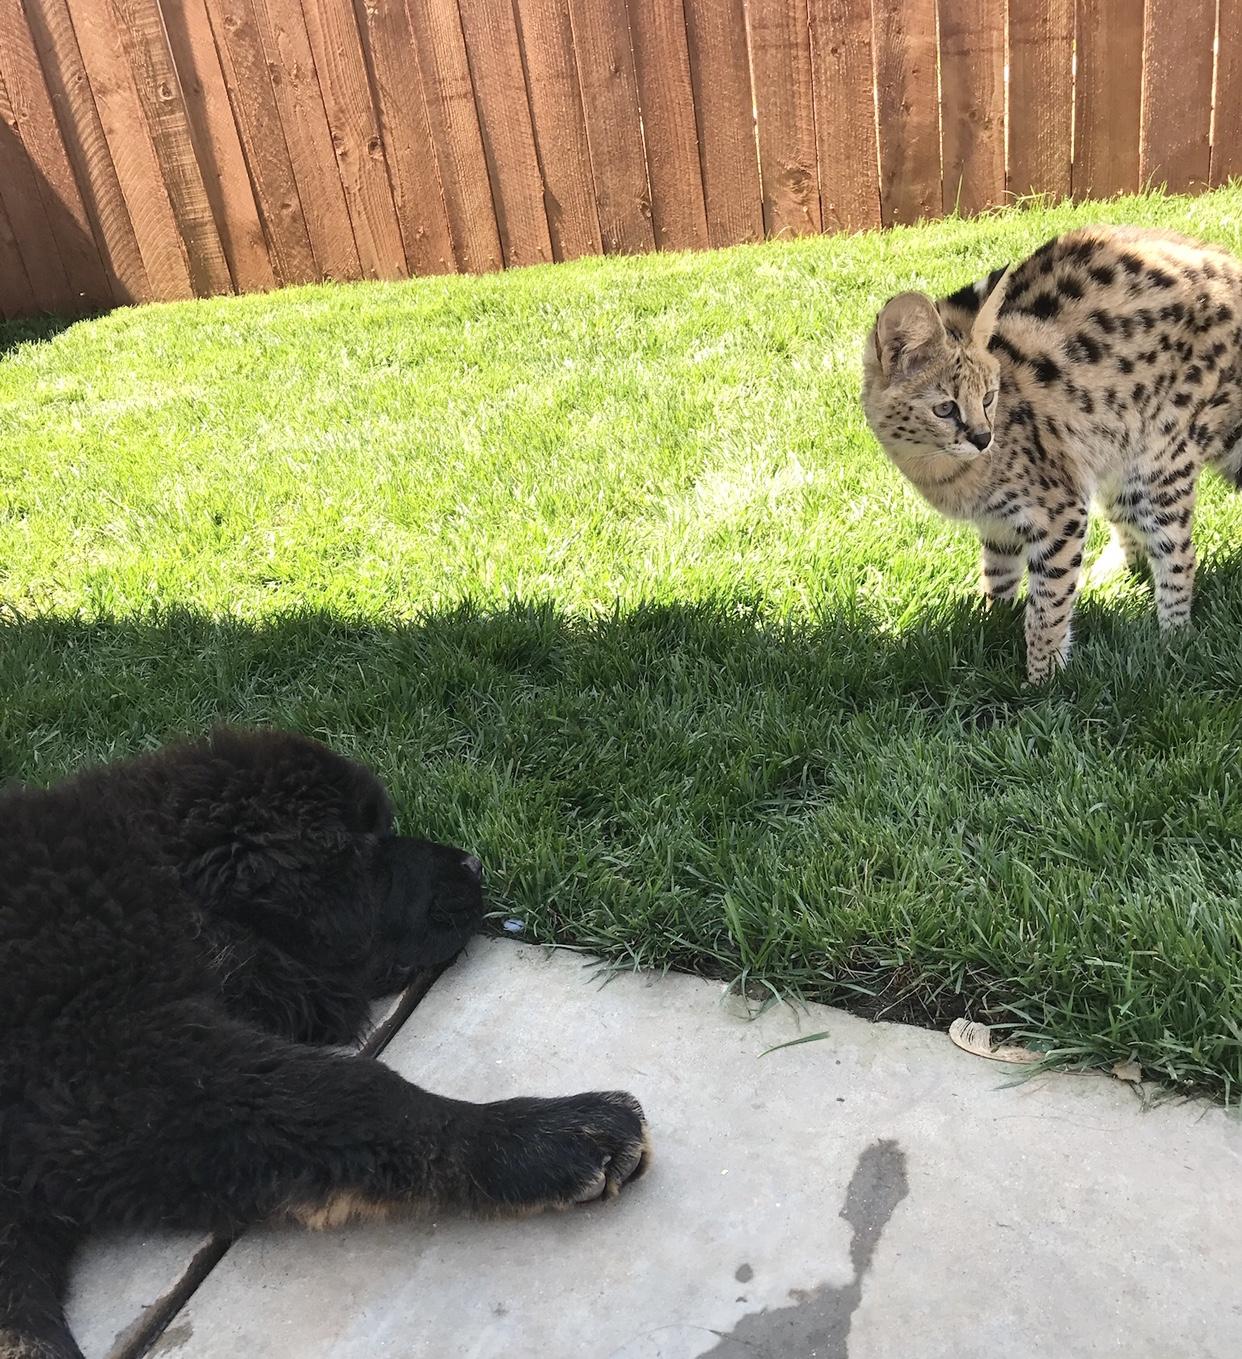 Serval Kitten & Tibetan Mastiff Puppy